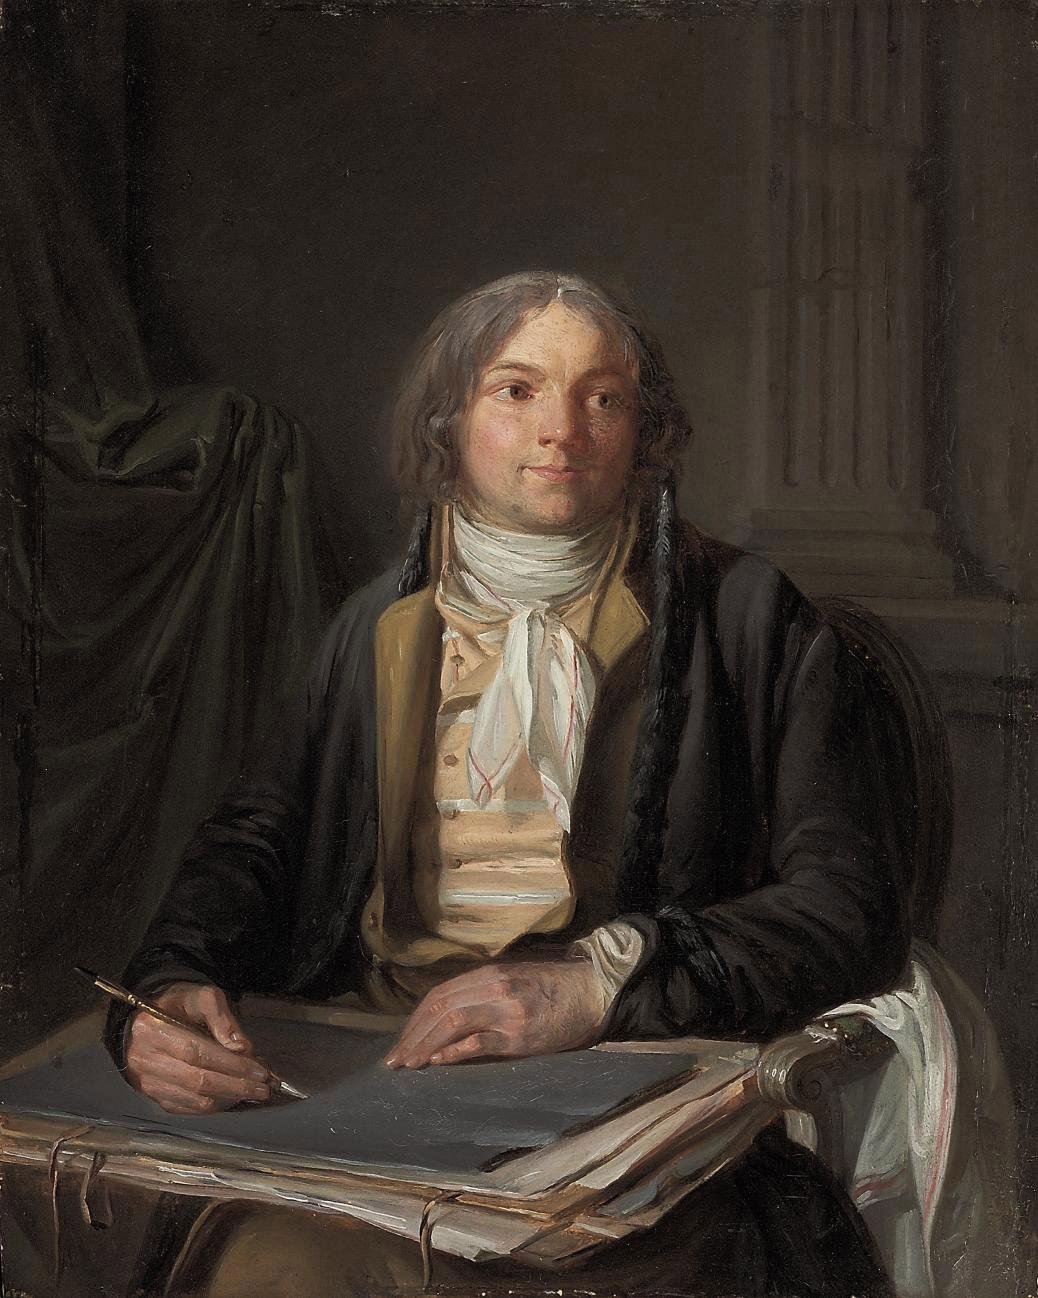 Portrait of an artist sketching